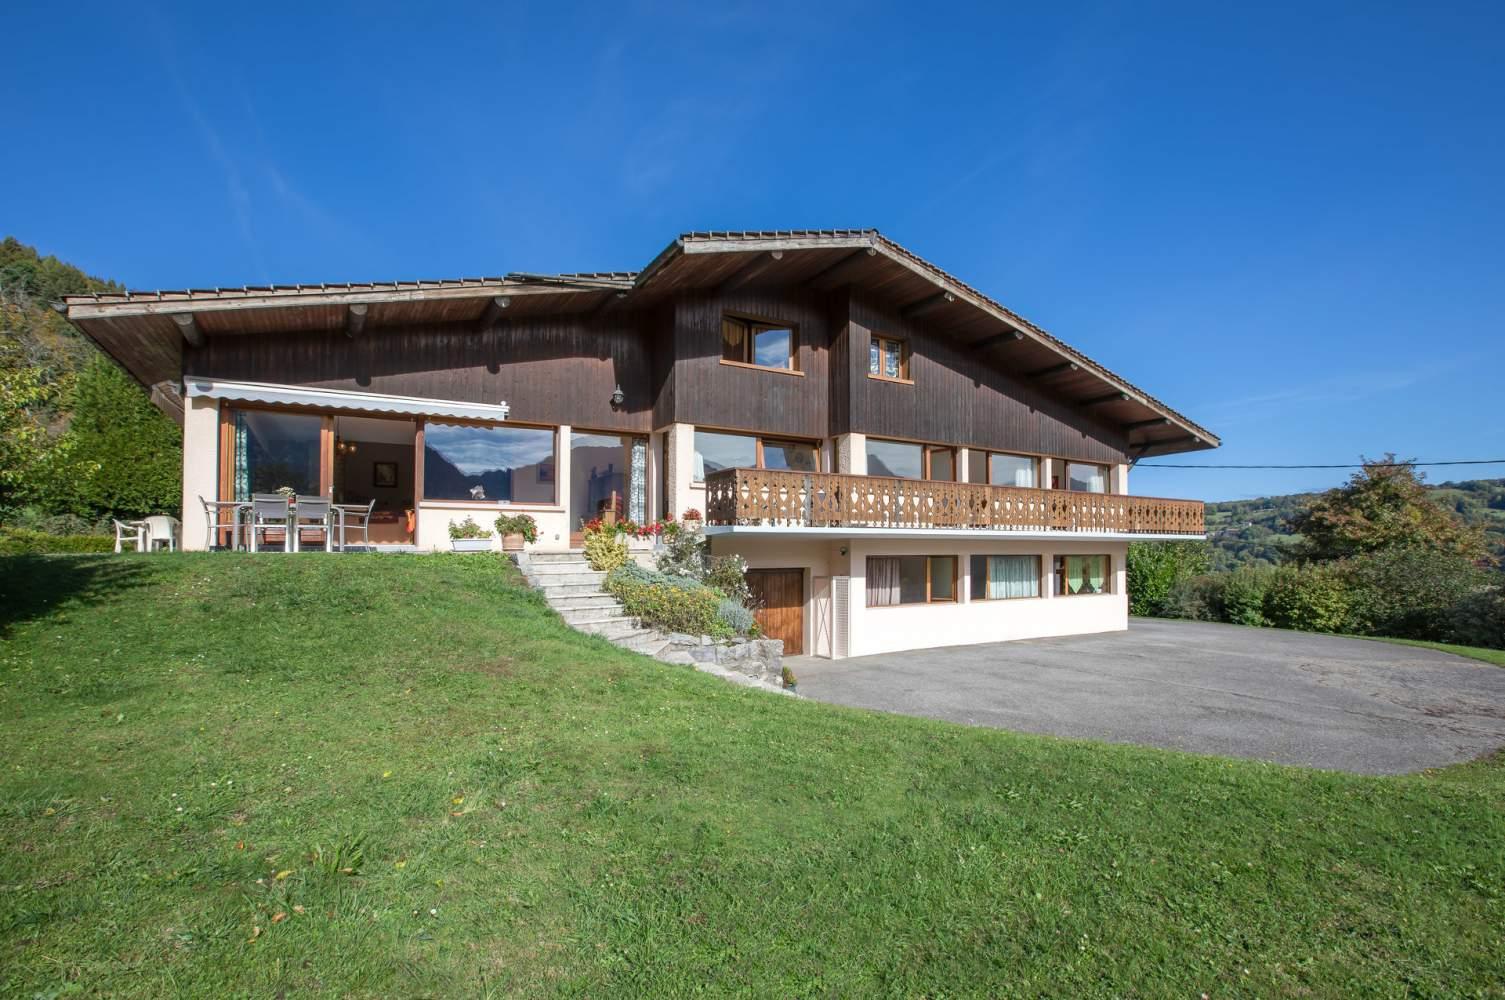 Thonon-les-Bains  - Casa 8 Cuartos 6 Habitaciones - picture 1